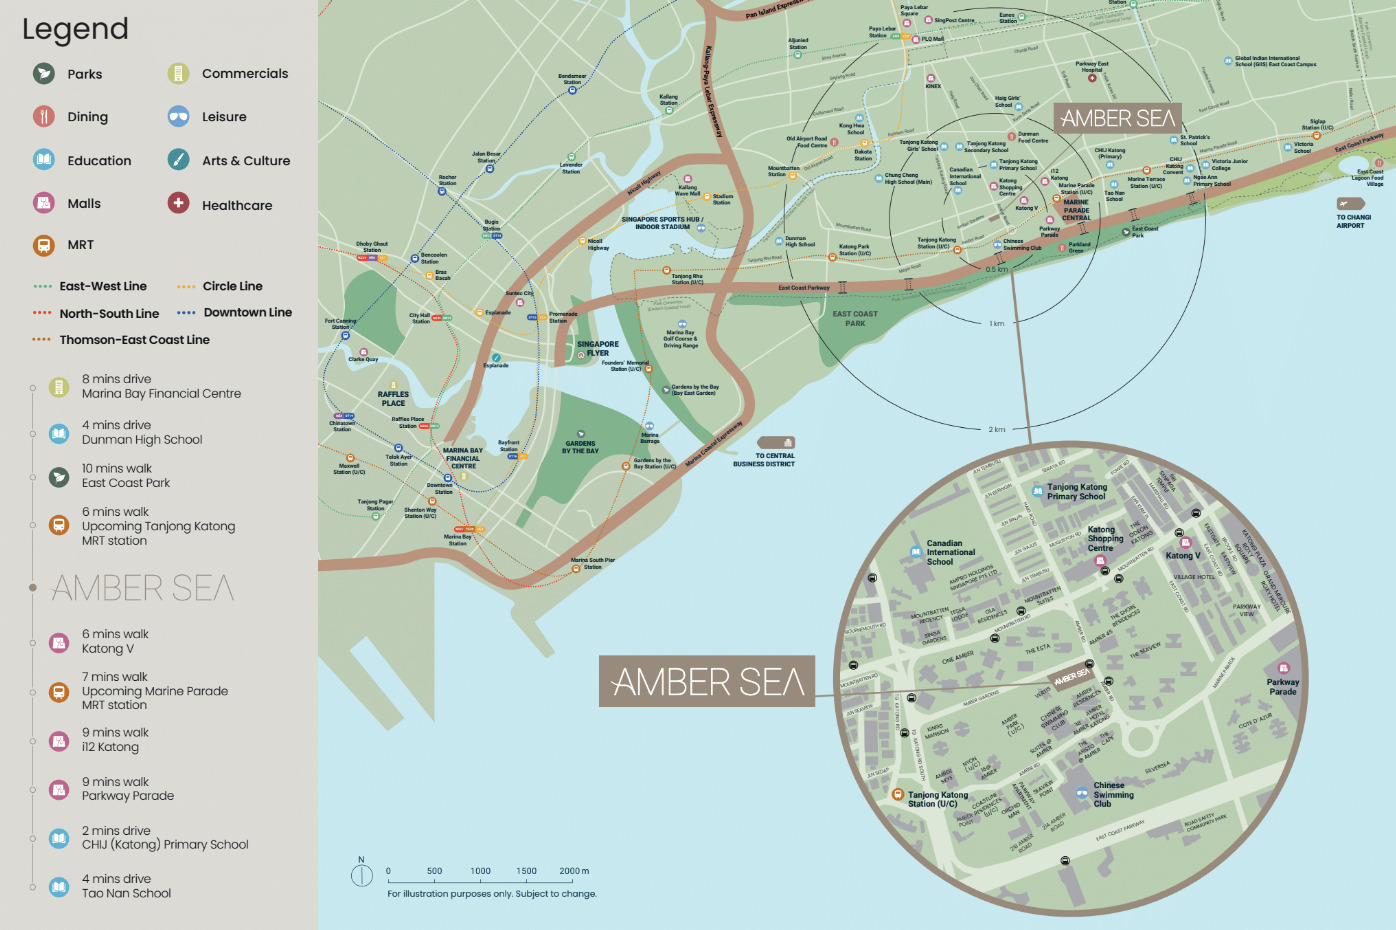 Amber Sea Location